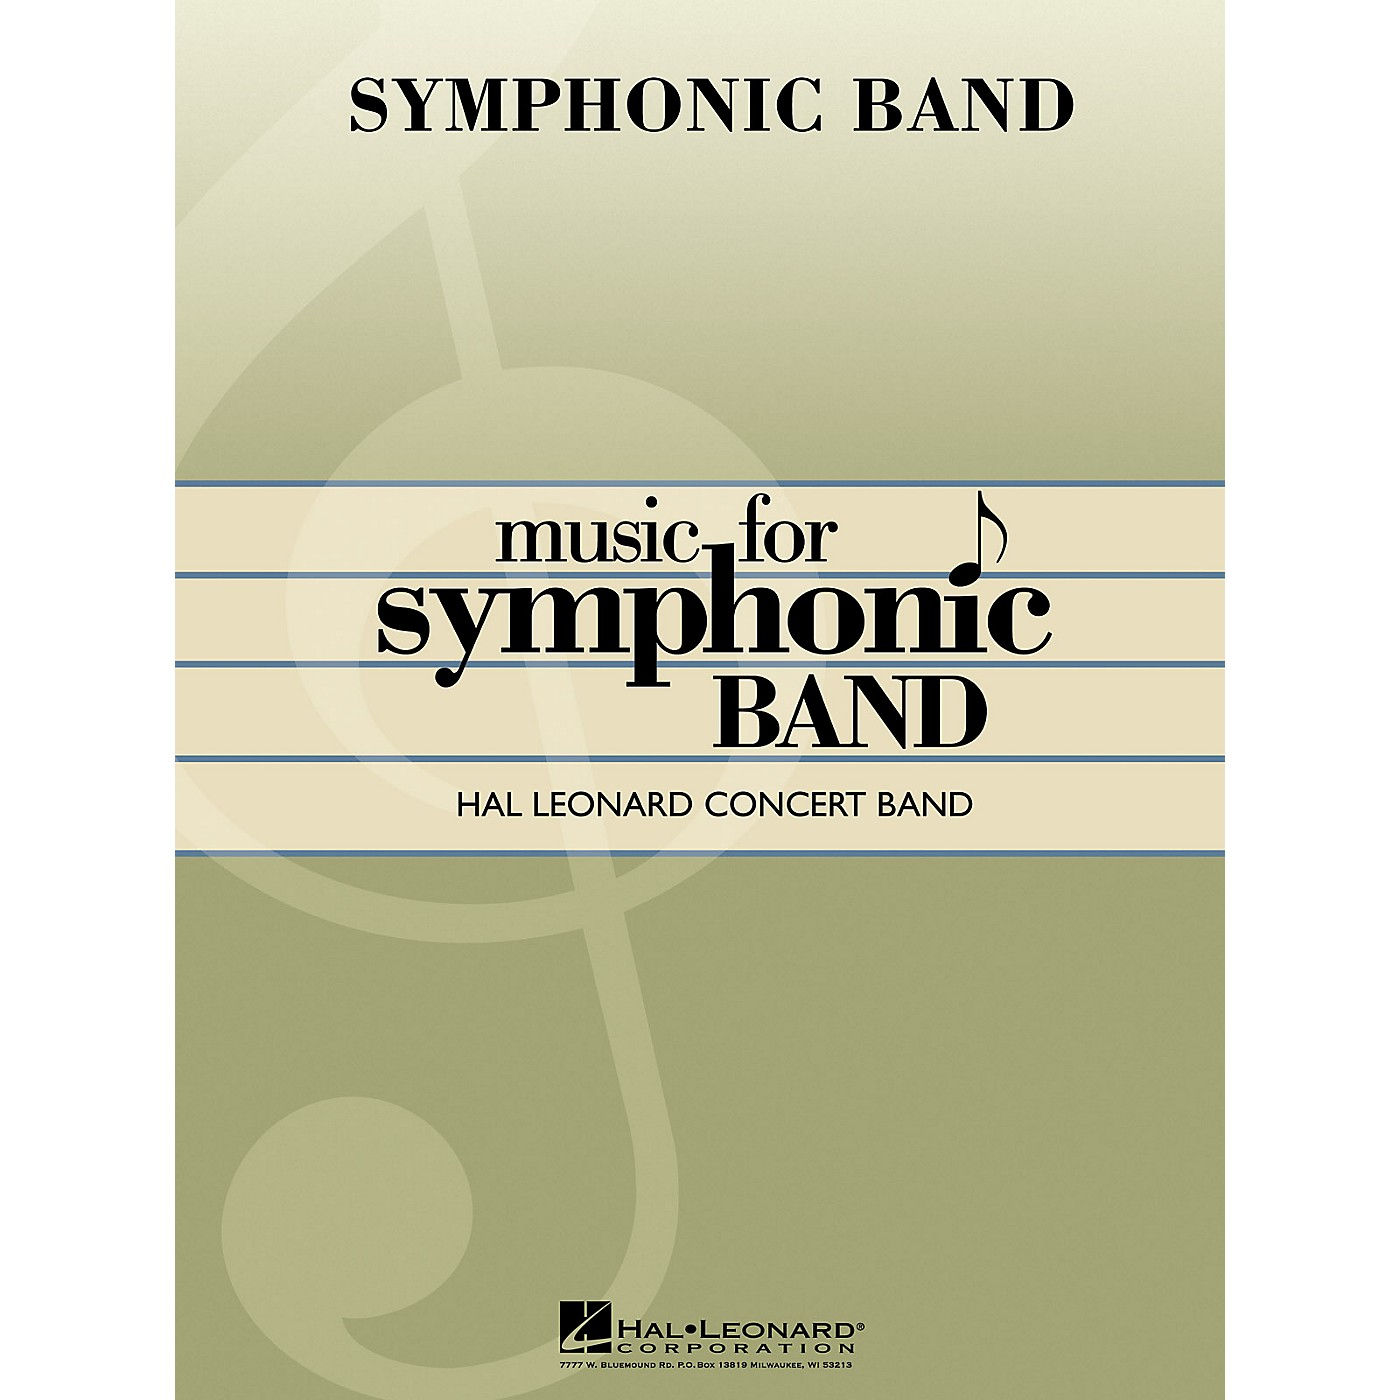 Hal Leonard Scenes from La Boheme Concert Band Level 4 Arranged by Jerry Bilik thumbnail